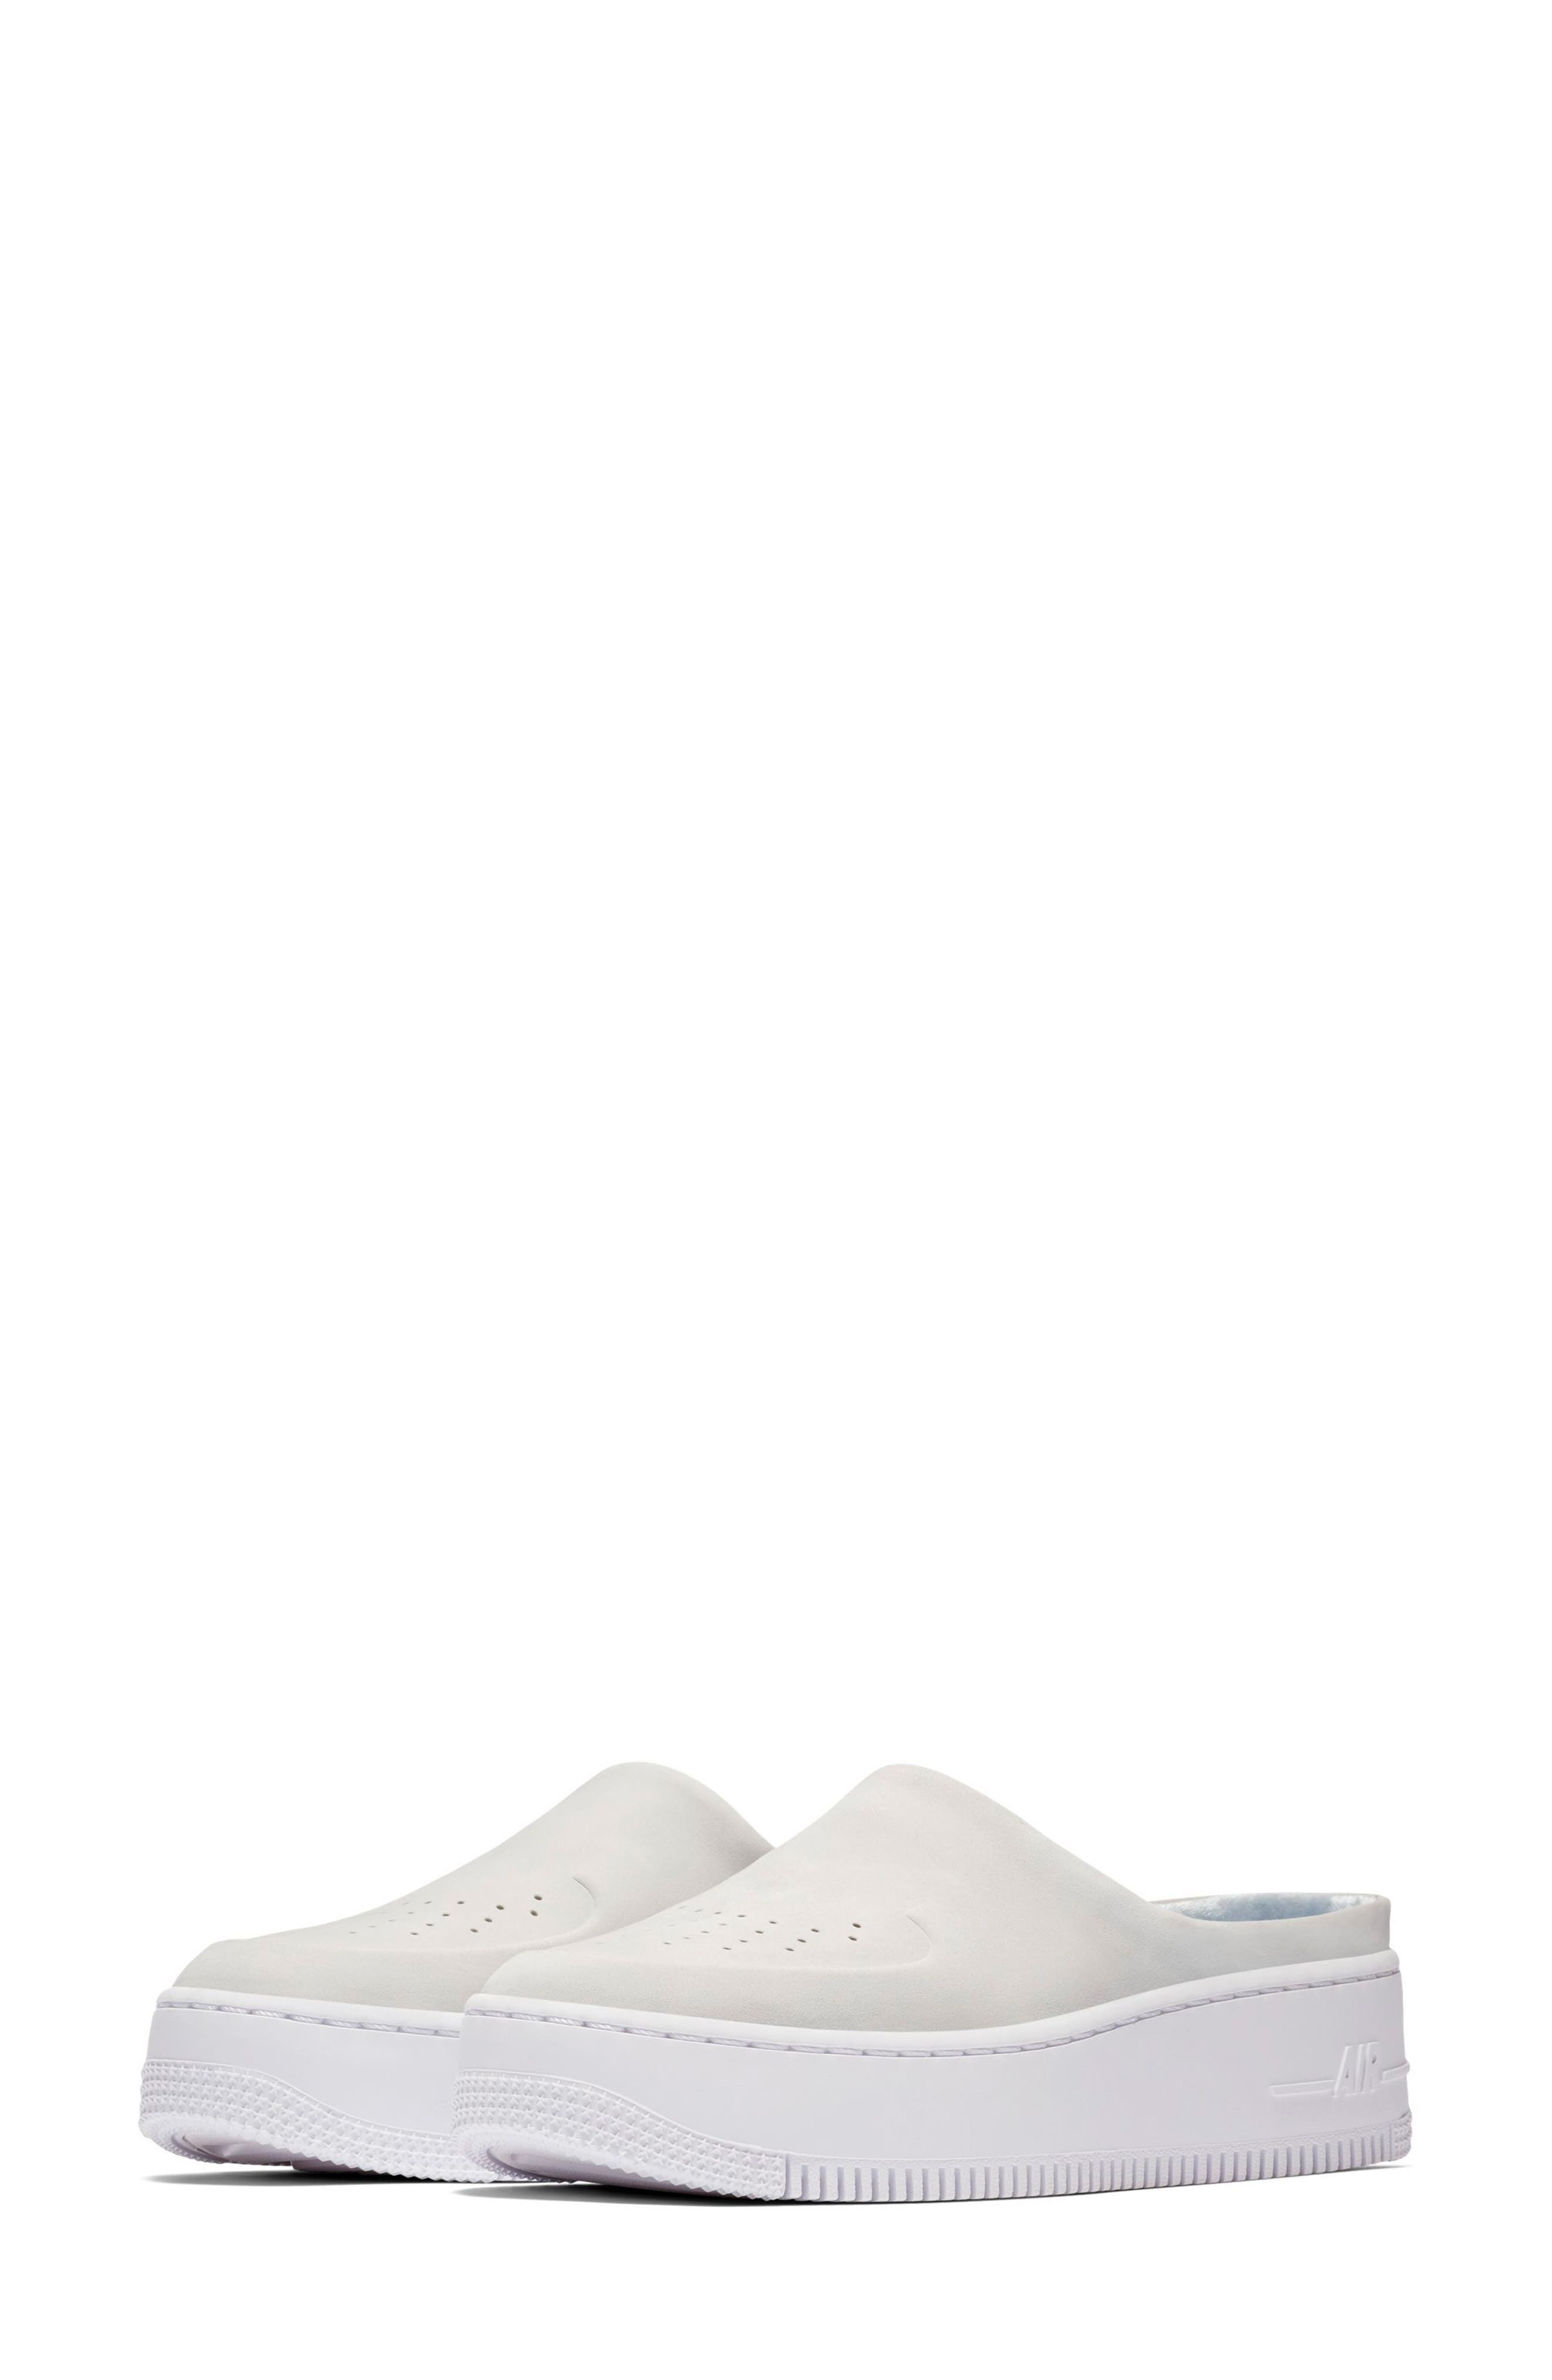 Air Force 1 Lover XX Slip-On Mule Sneaker,                             Main thumbnail 1, color,